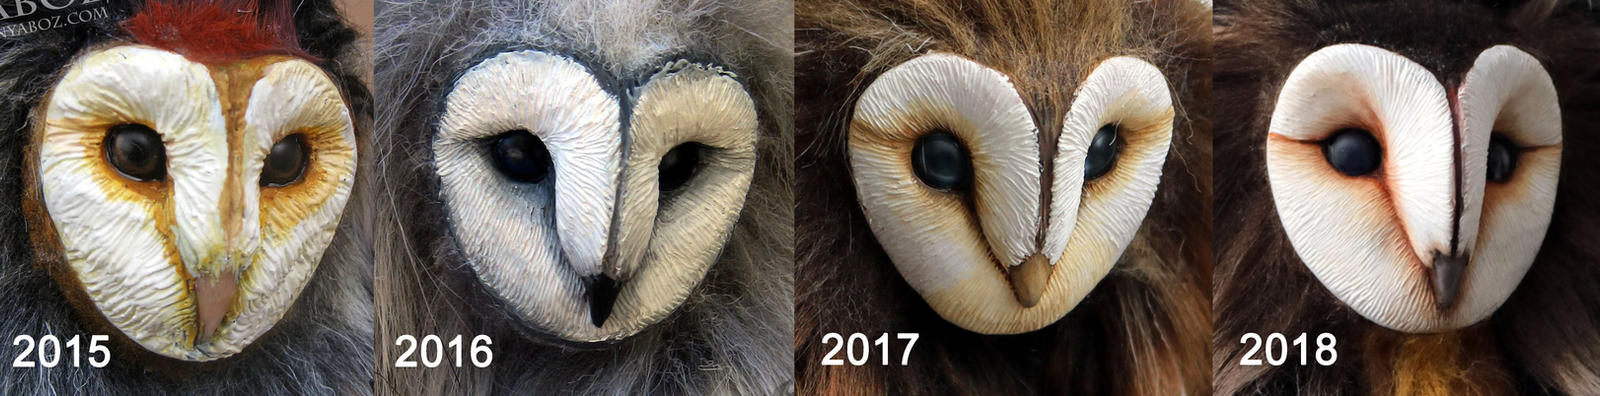 Barn Owl Sculpting Progression